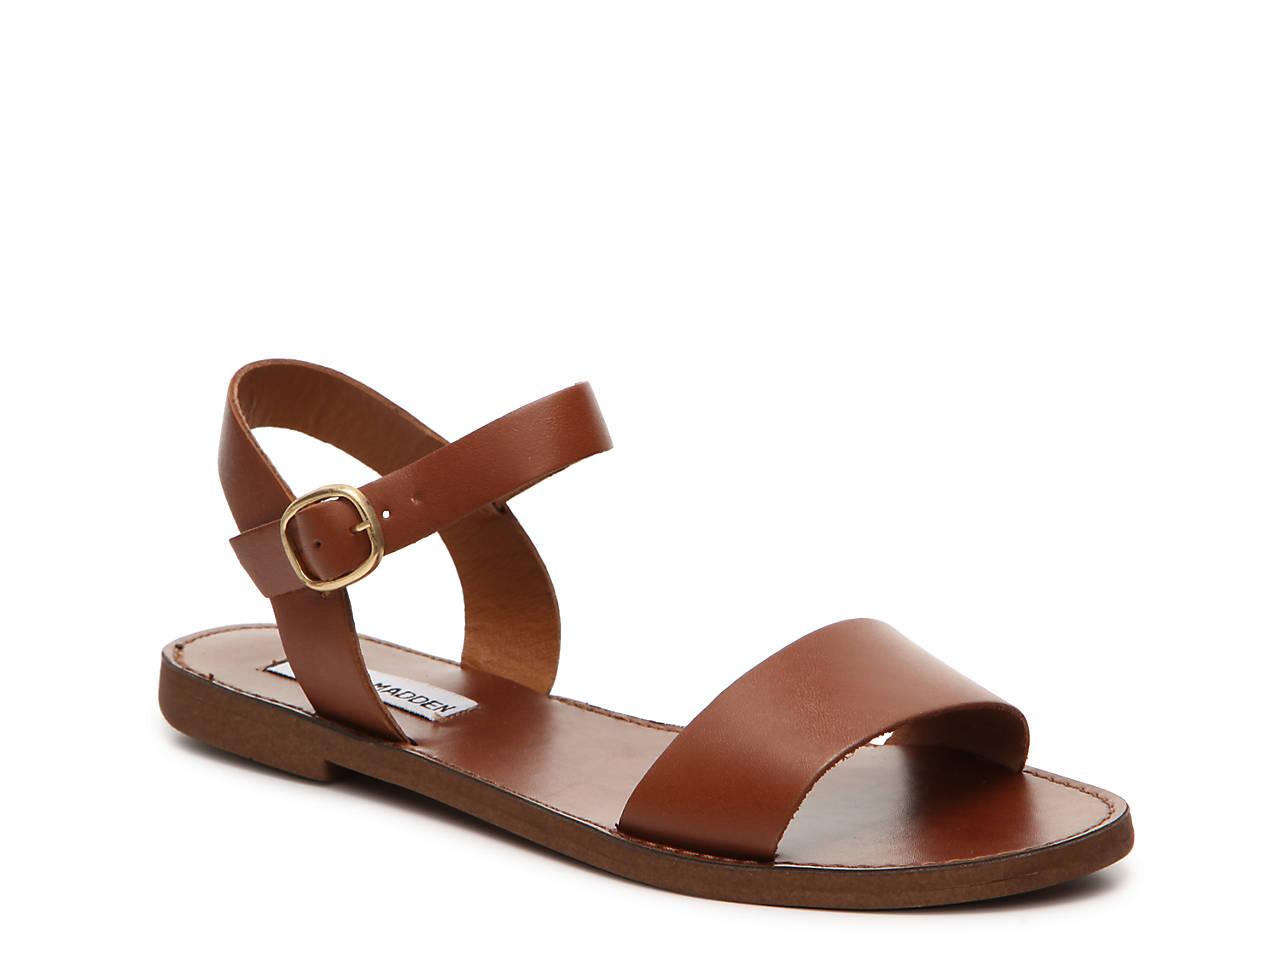 Donddi Flat Sandal